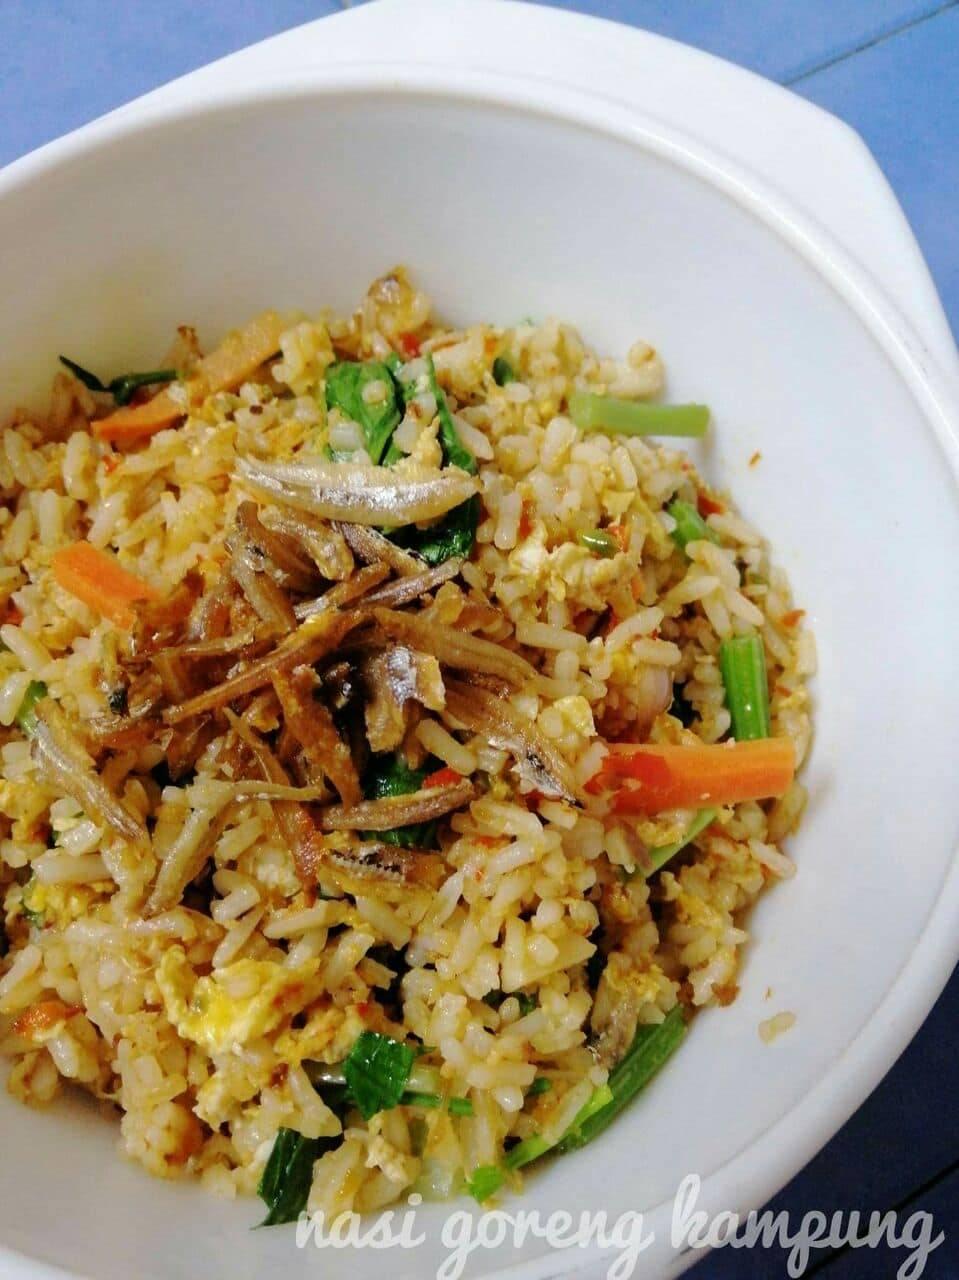 Nasi Goreng Kampung Tak Pernah Jemu Dimakan, Ini Resipi Paling Sedap